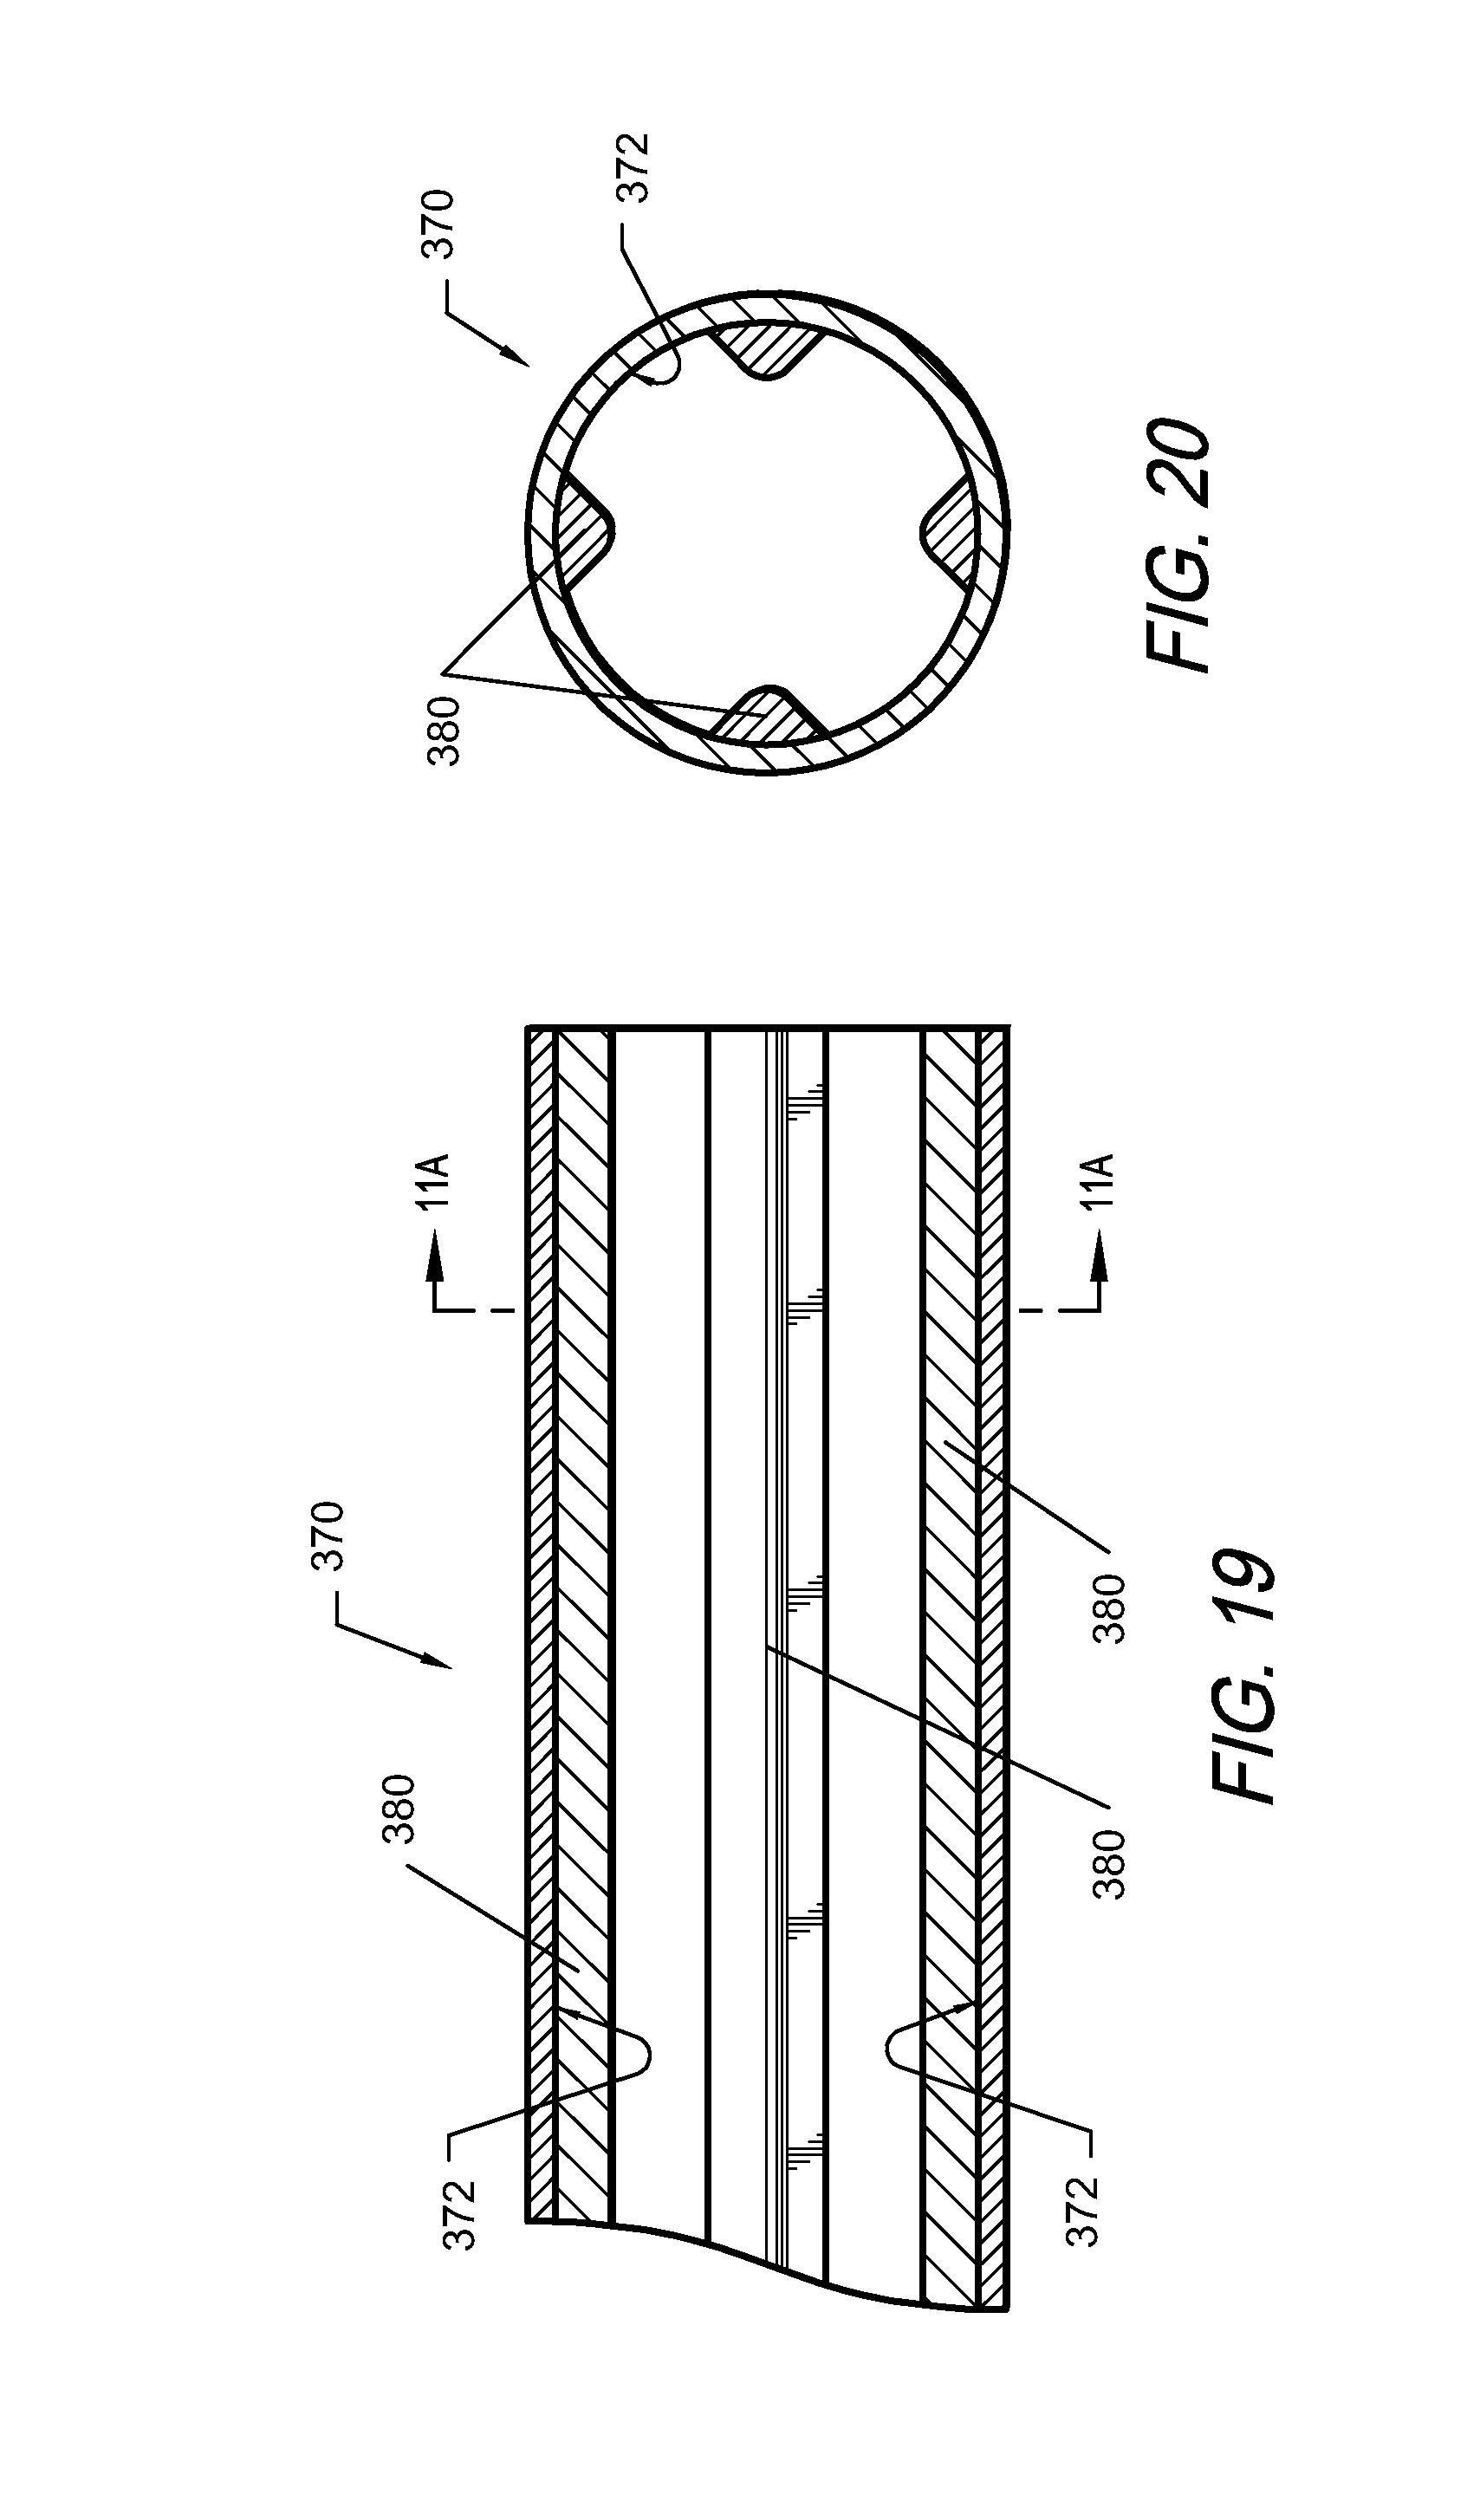 Wiring Diagram Also Zone Valve Wiring Diagram In Addition 1996 Ford F